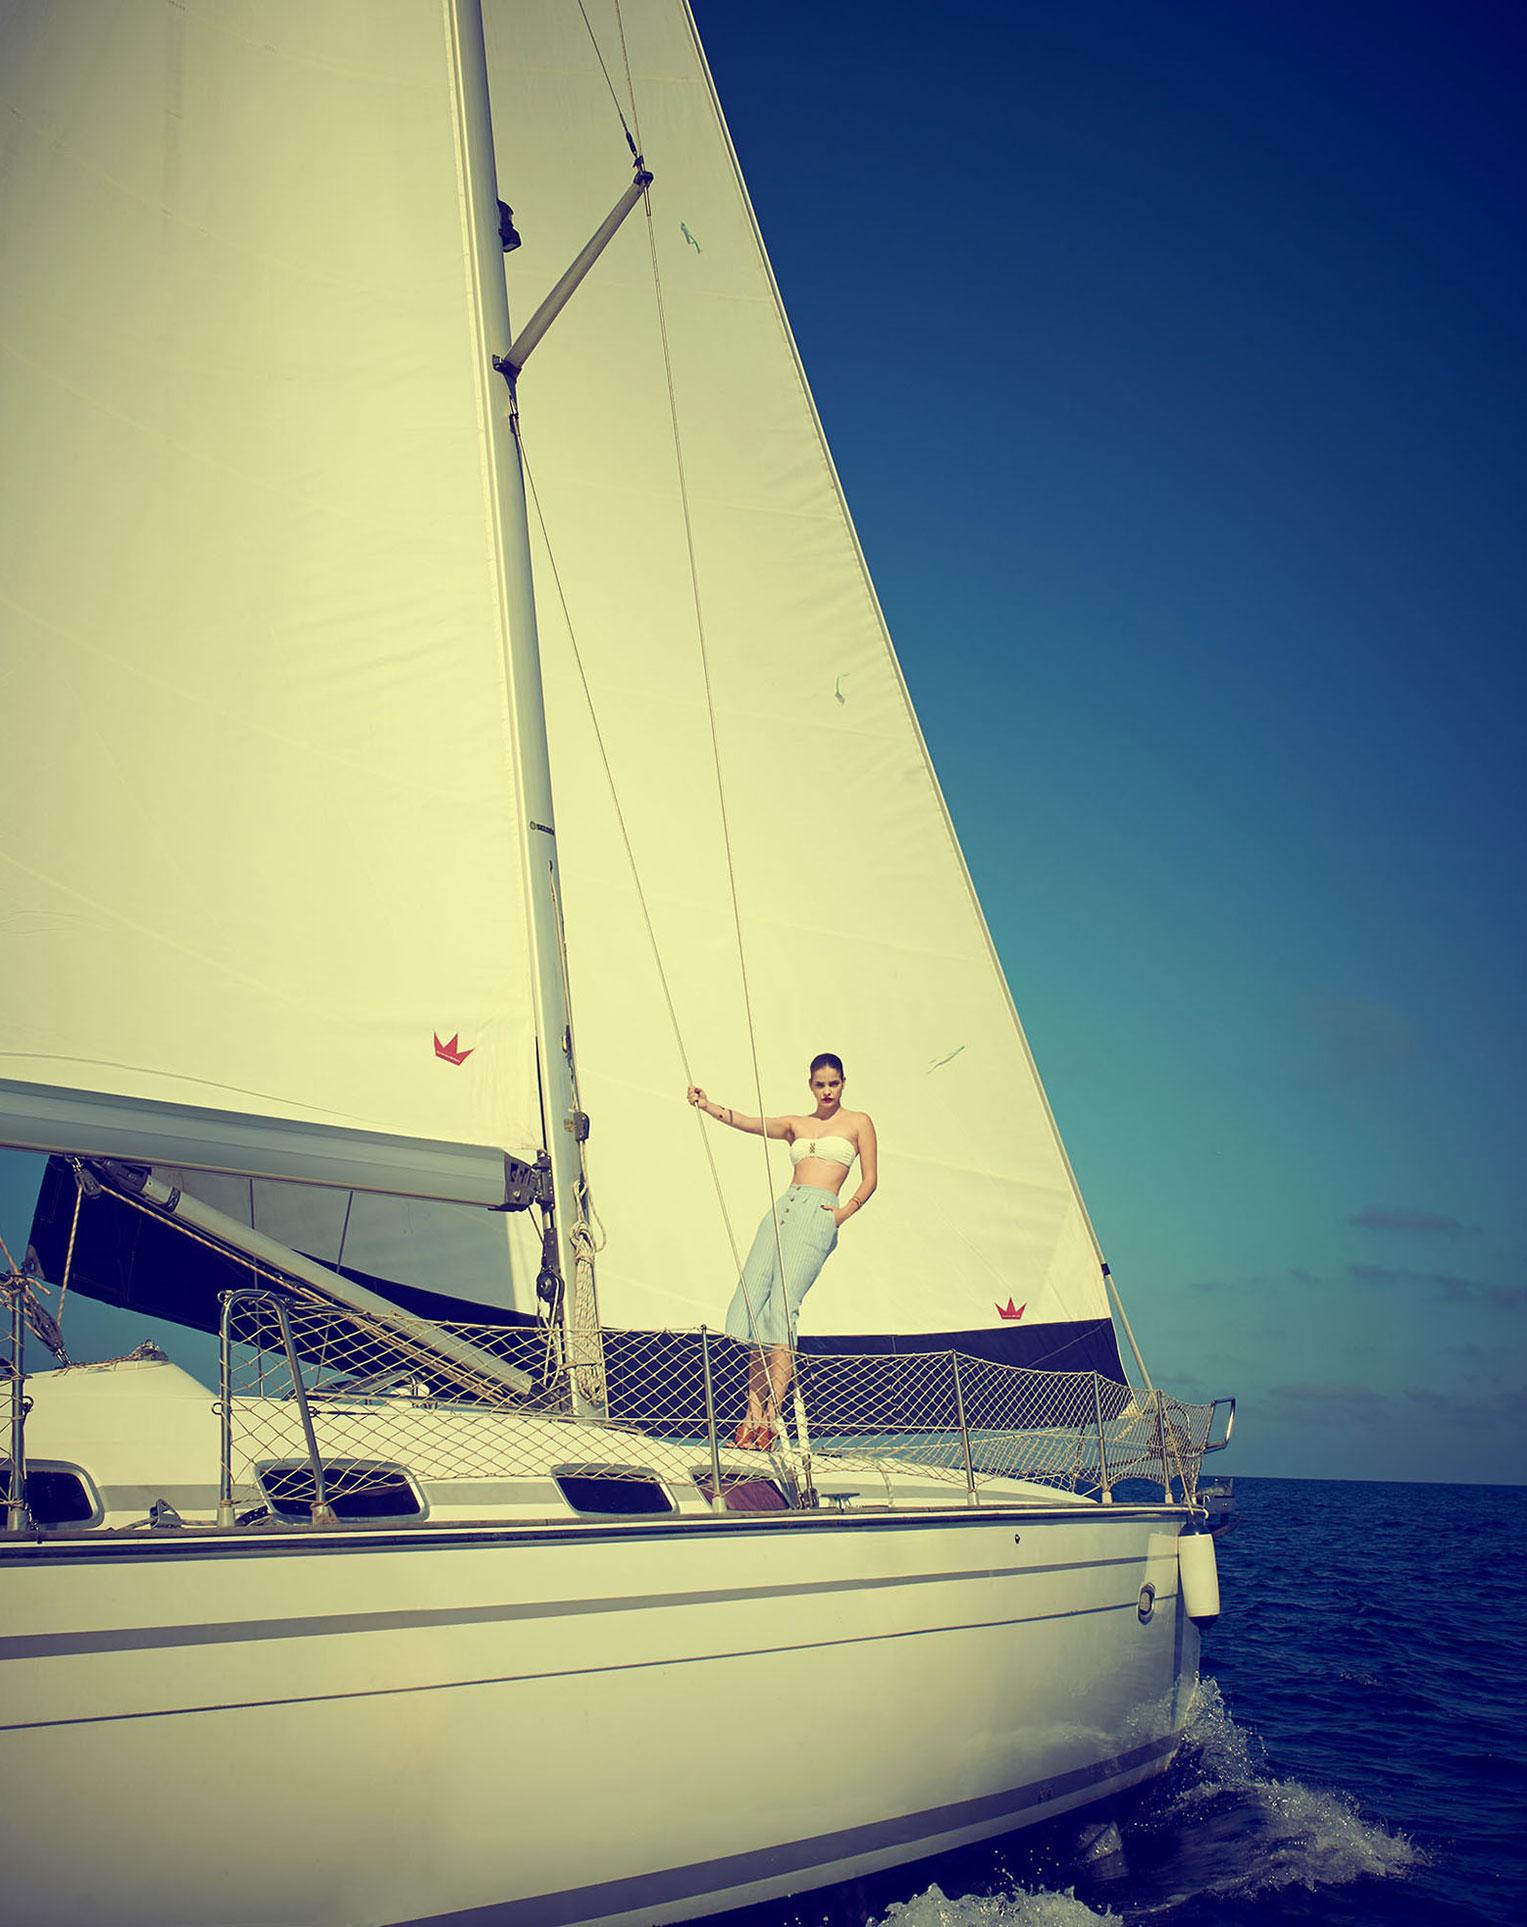 На яхте под жарким солнцем / Барбара Палвин, фотограф Хеви Мунтане / фото 07